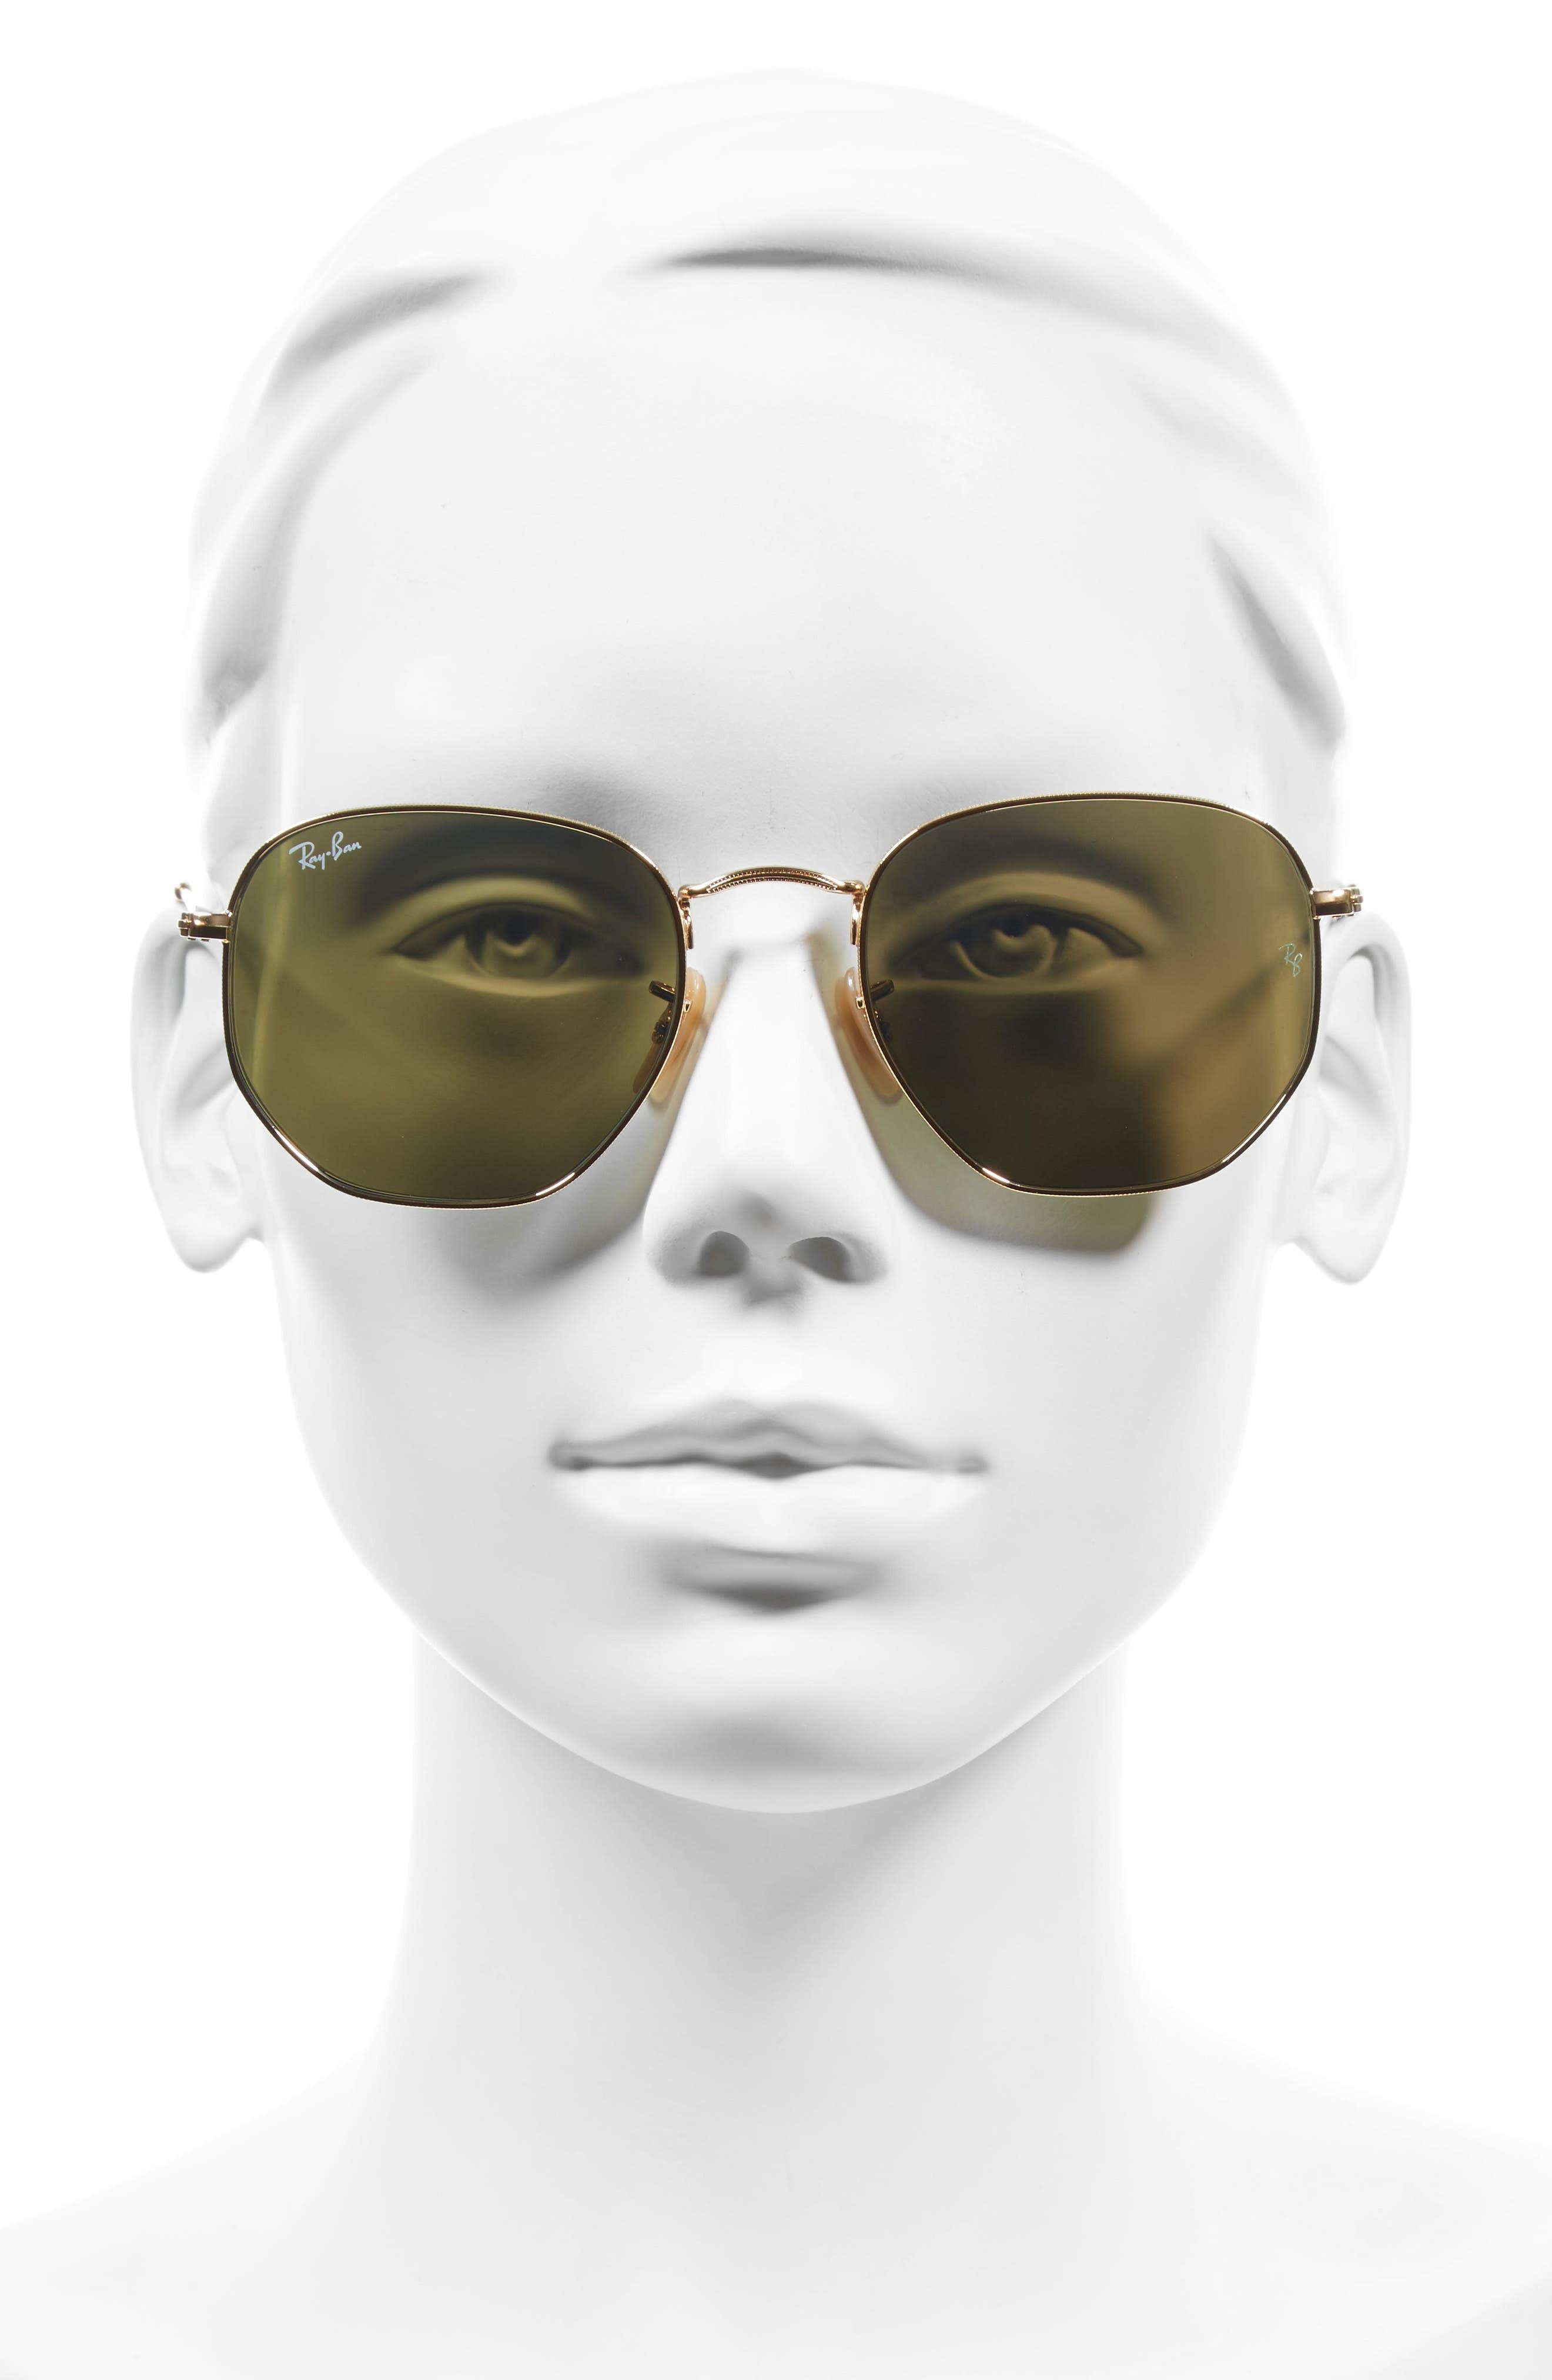 54mm Hexagonal Flat Lens Sunglasses,                             Alternate thumbnail 2, color,                             708